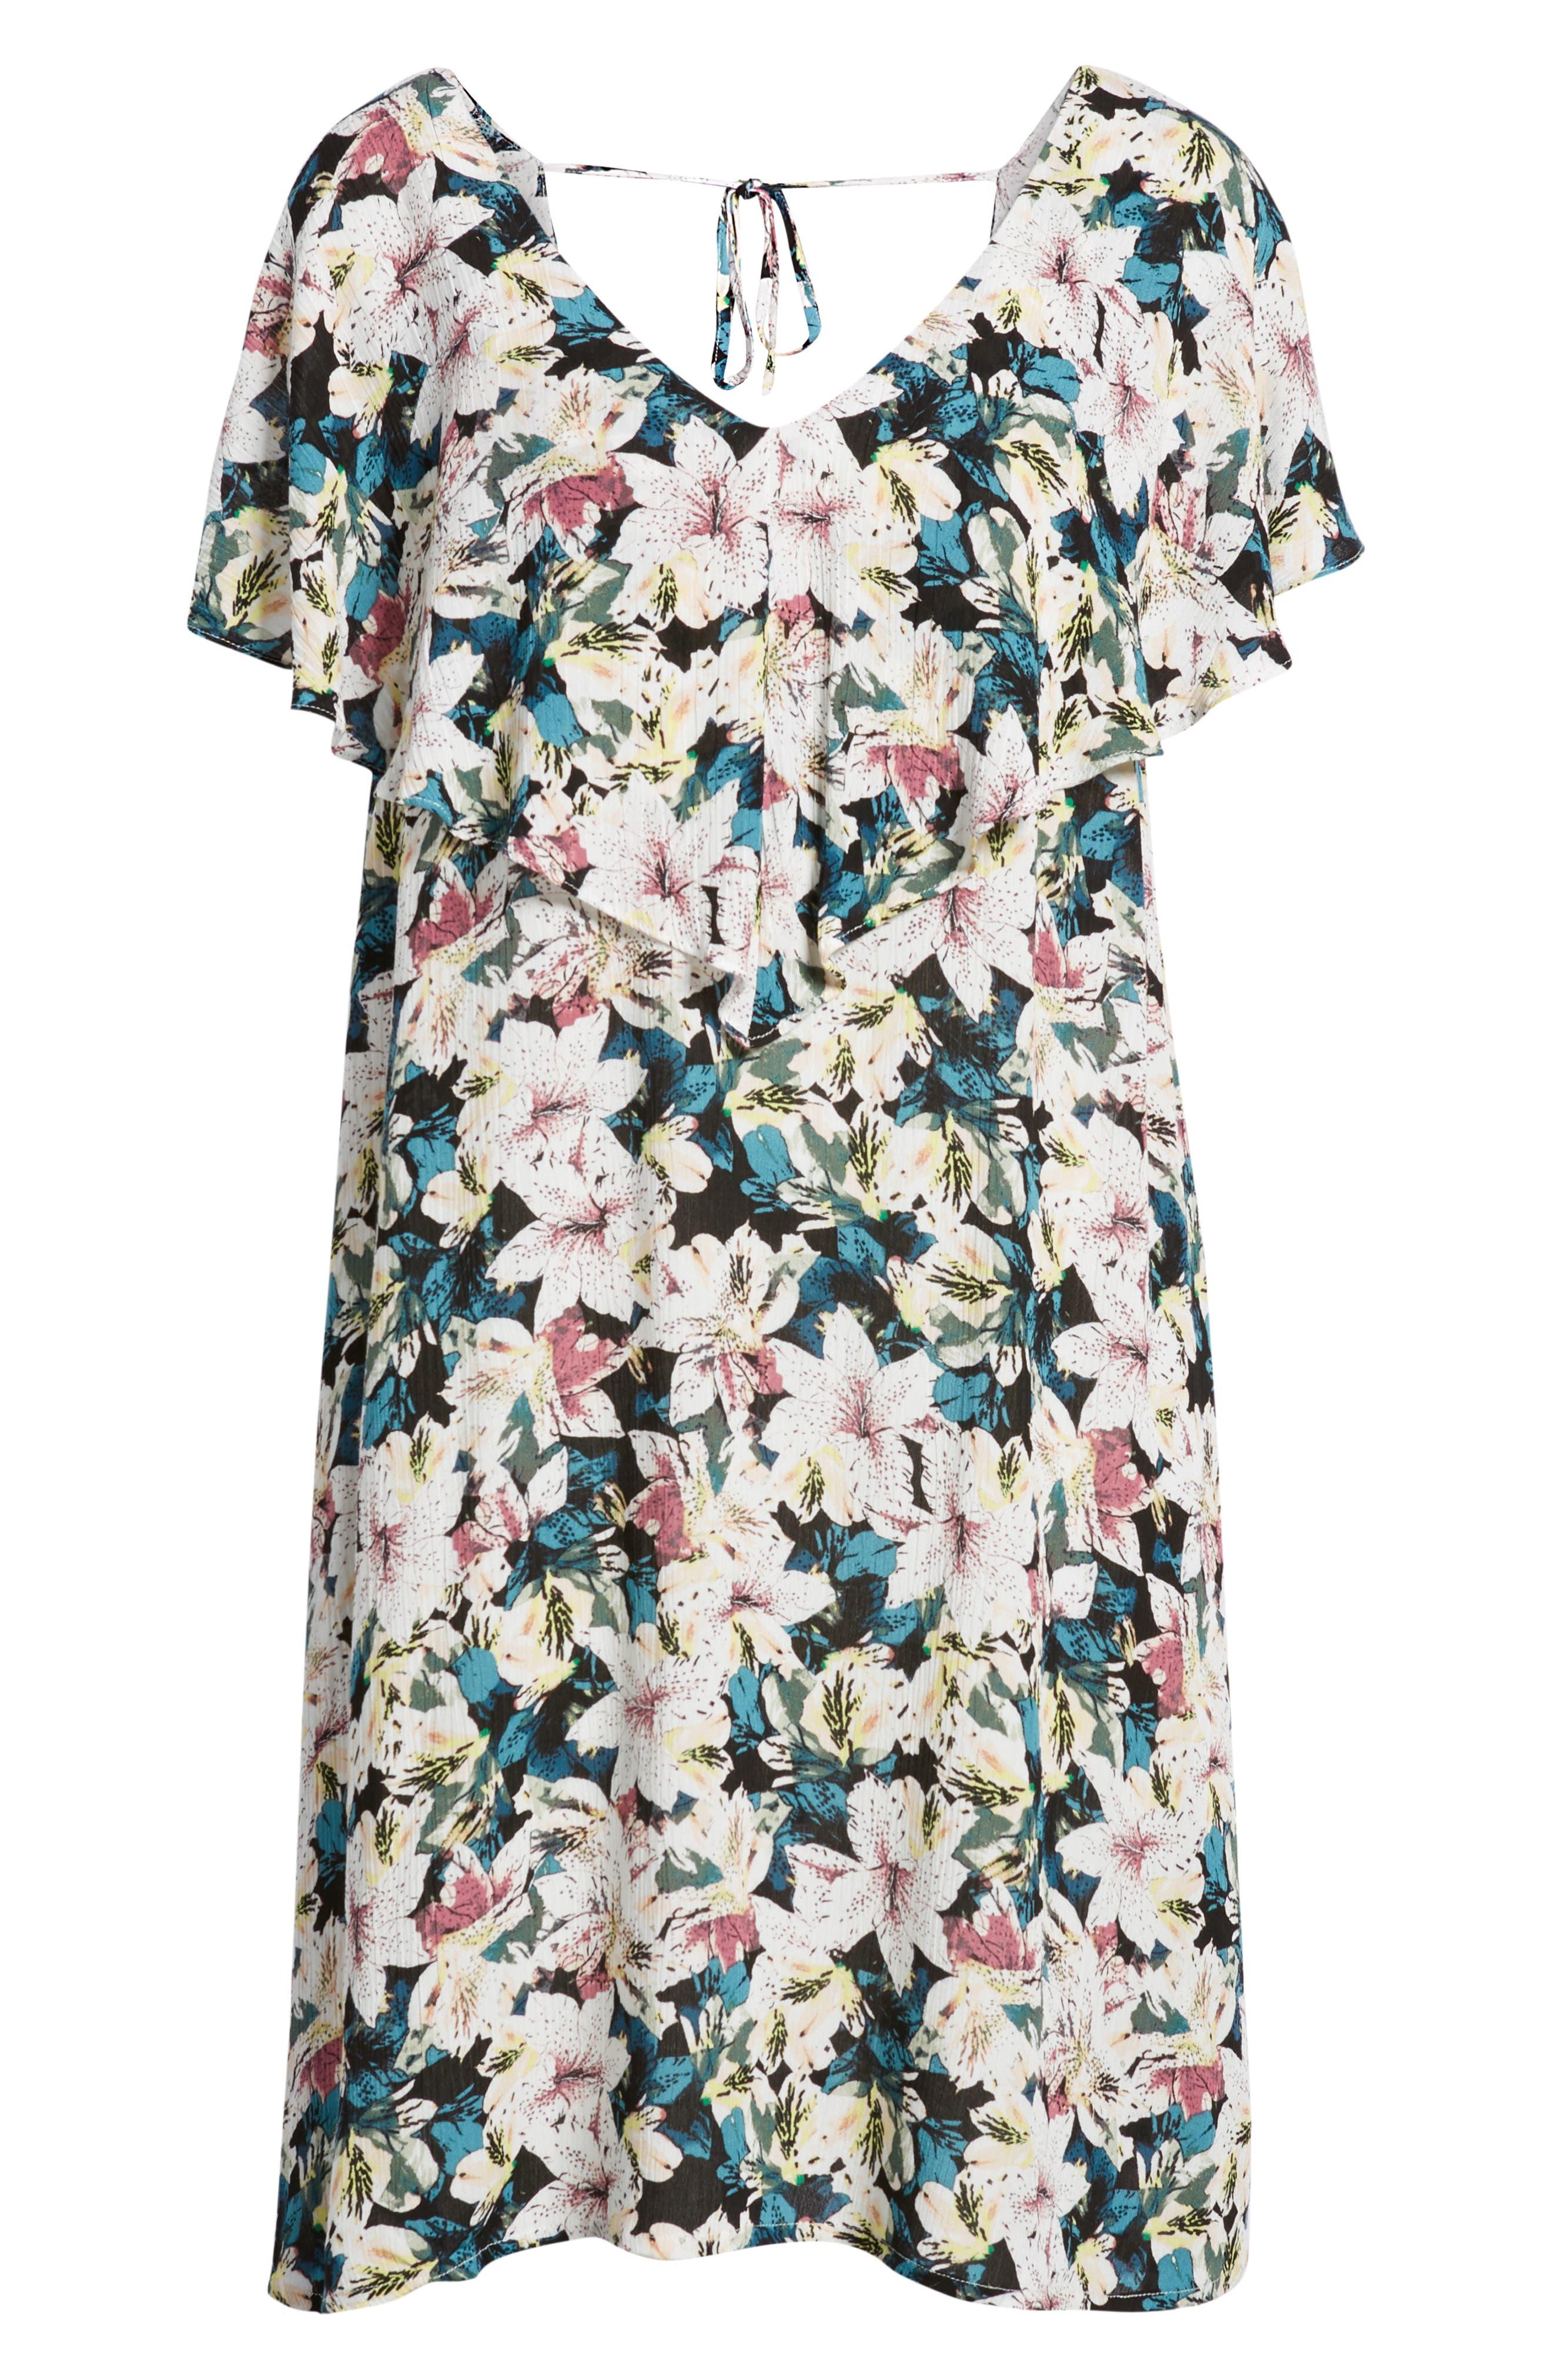 Miran Floral Print Woven Dress,                             Alternate thumbnail 4, color,                             100